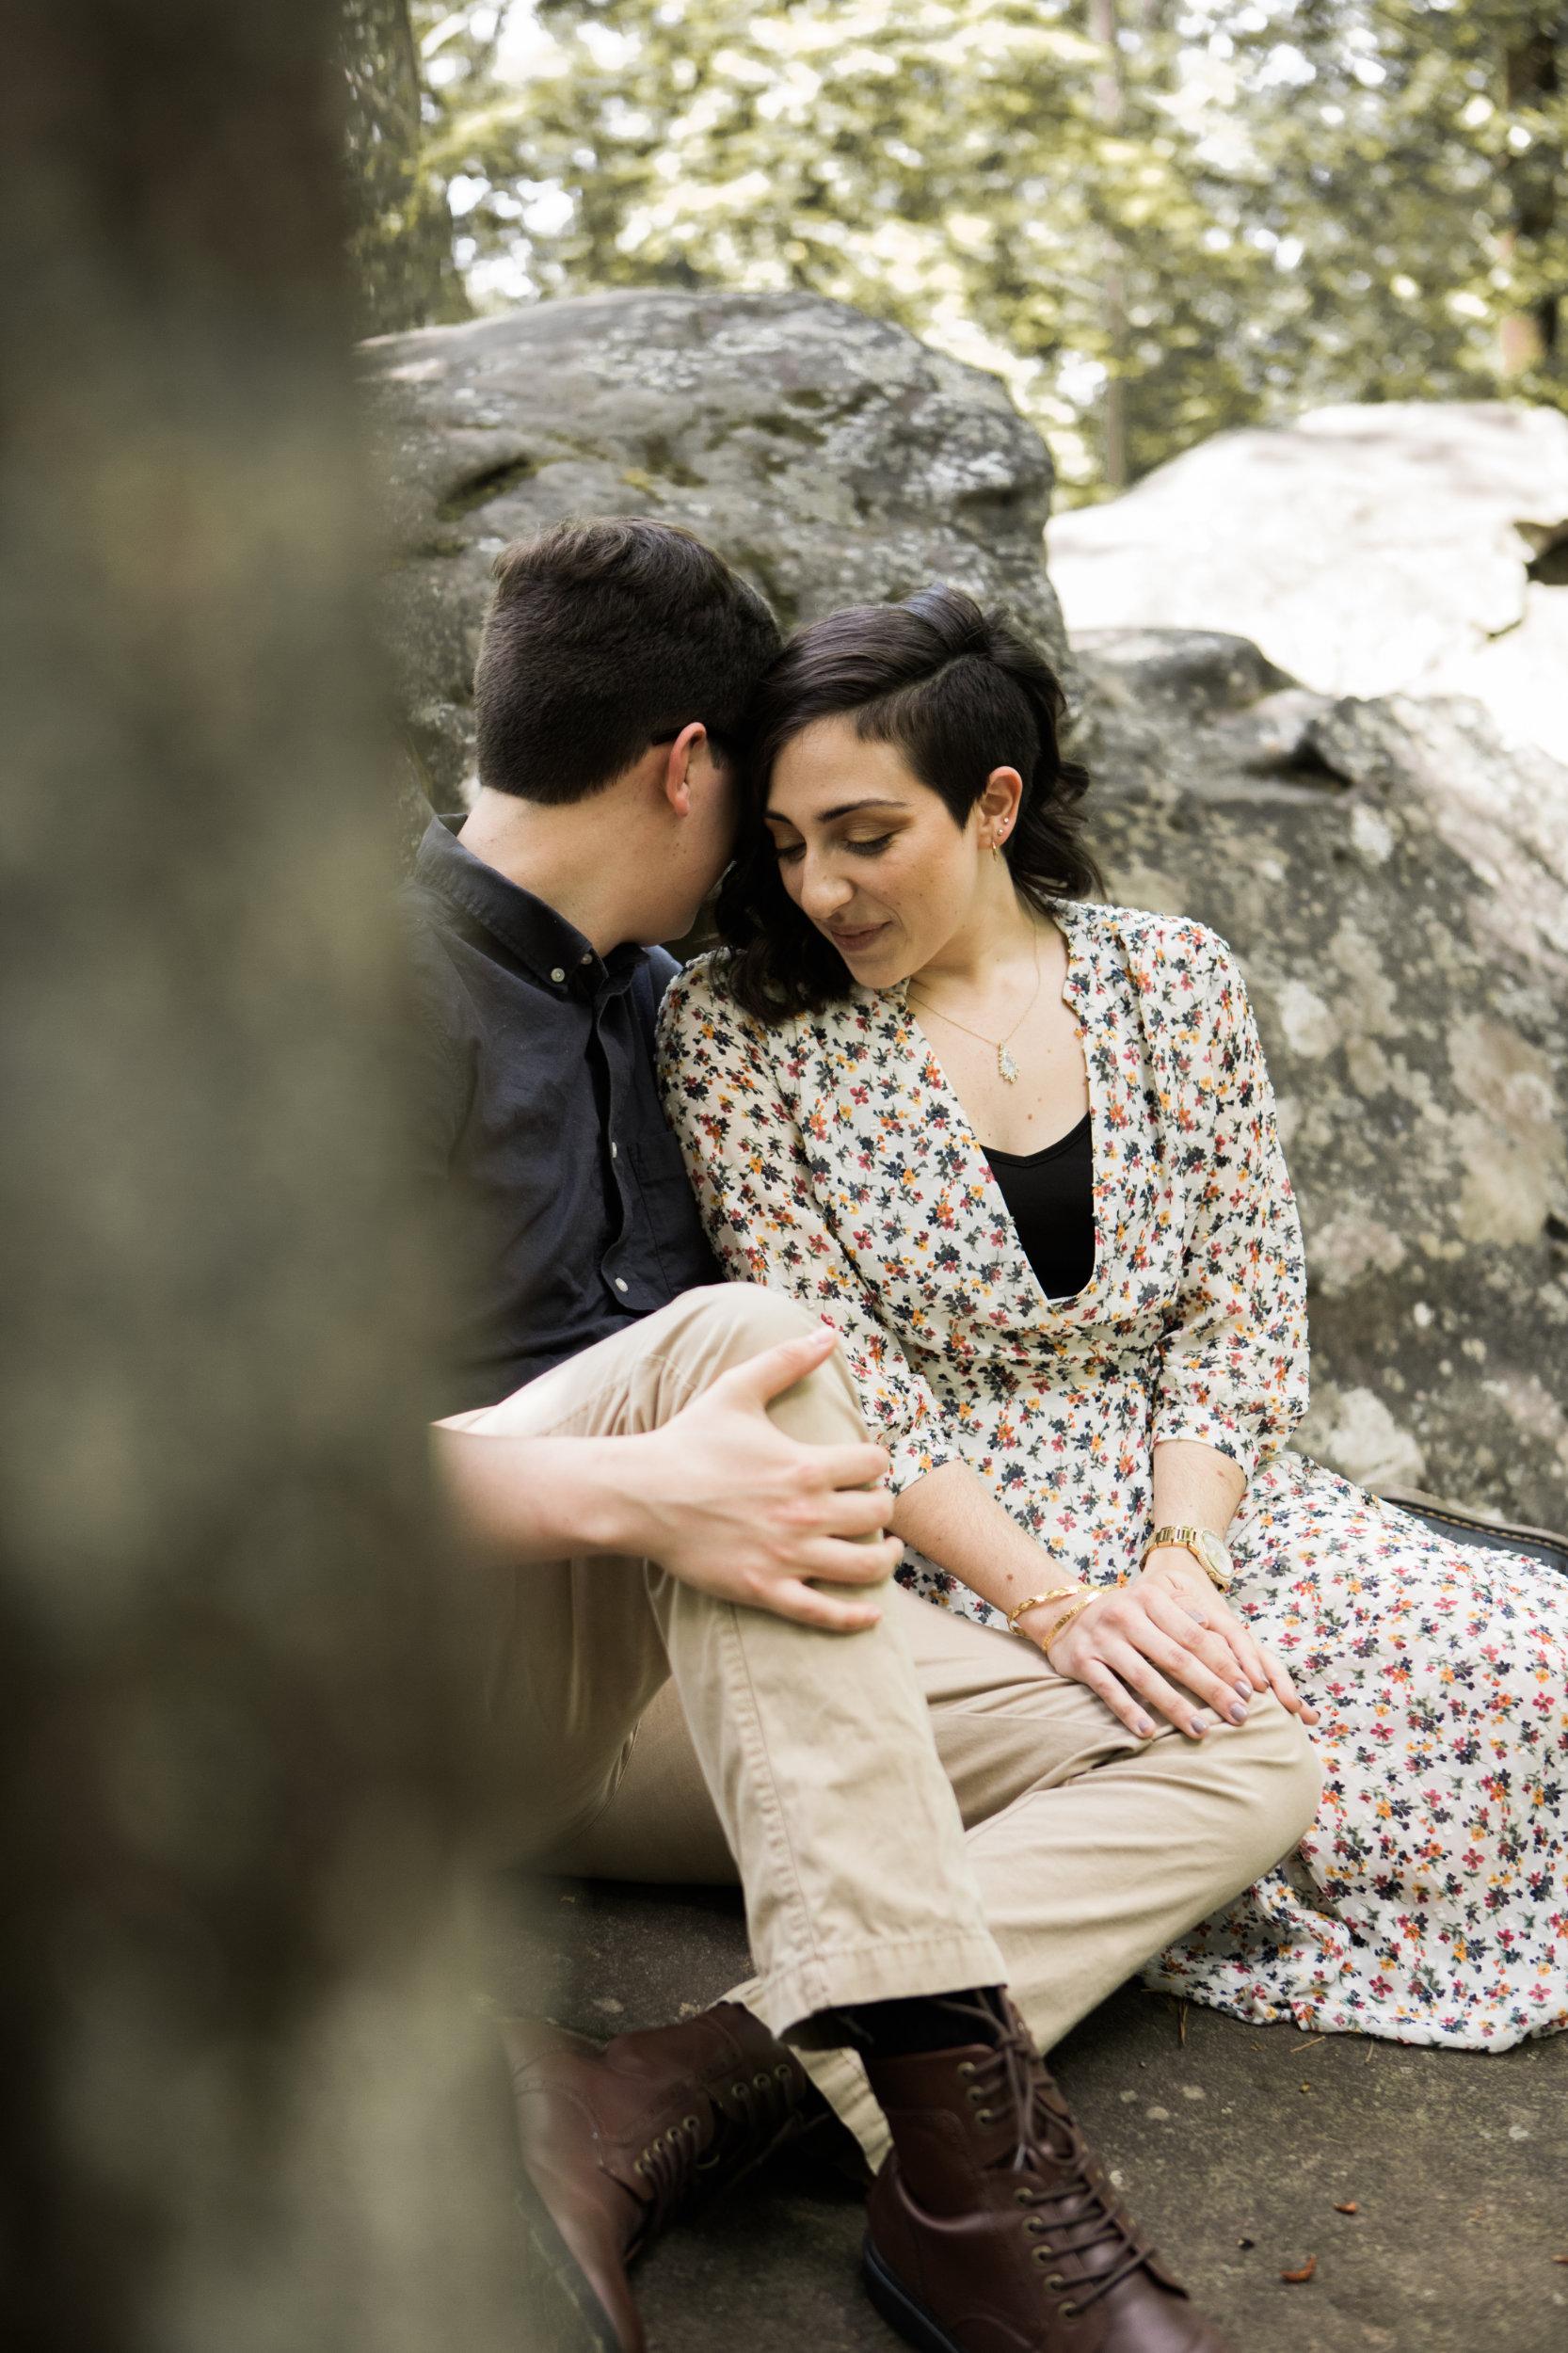 Moss Rock Preserve | Engagement Session | Hoover, AL